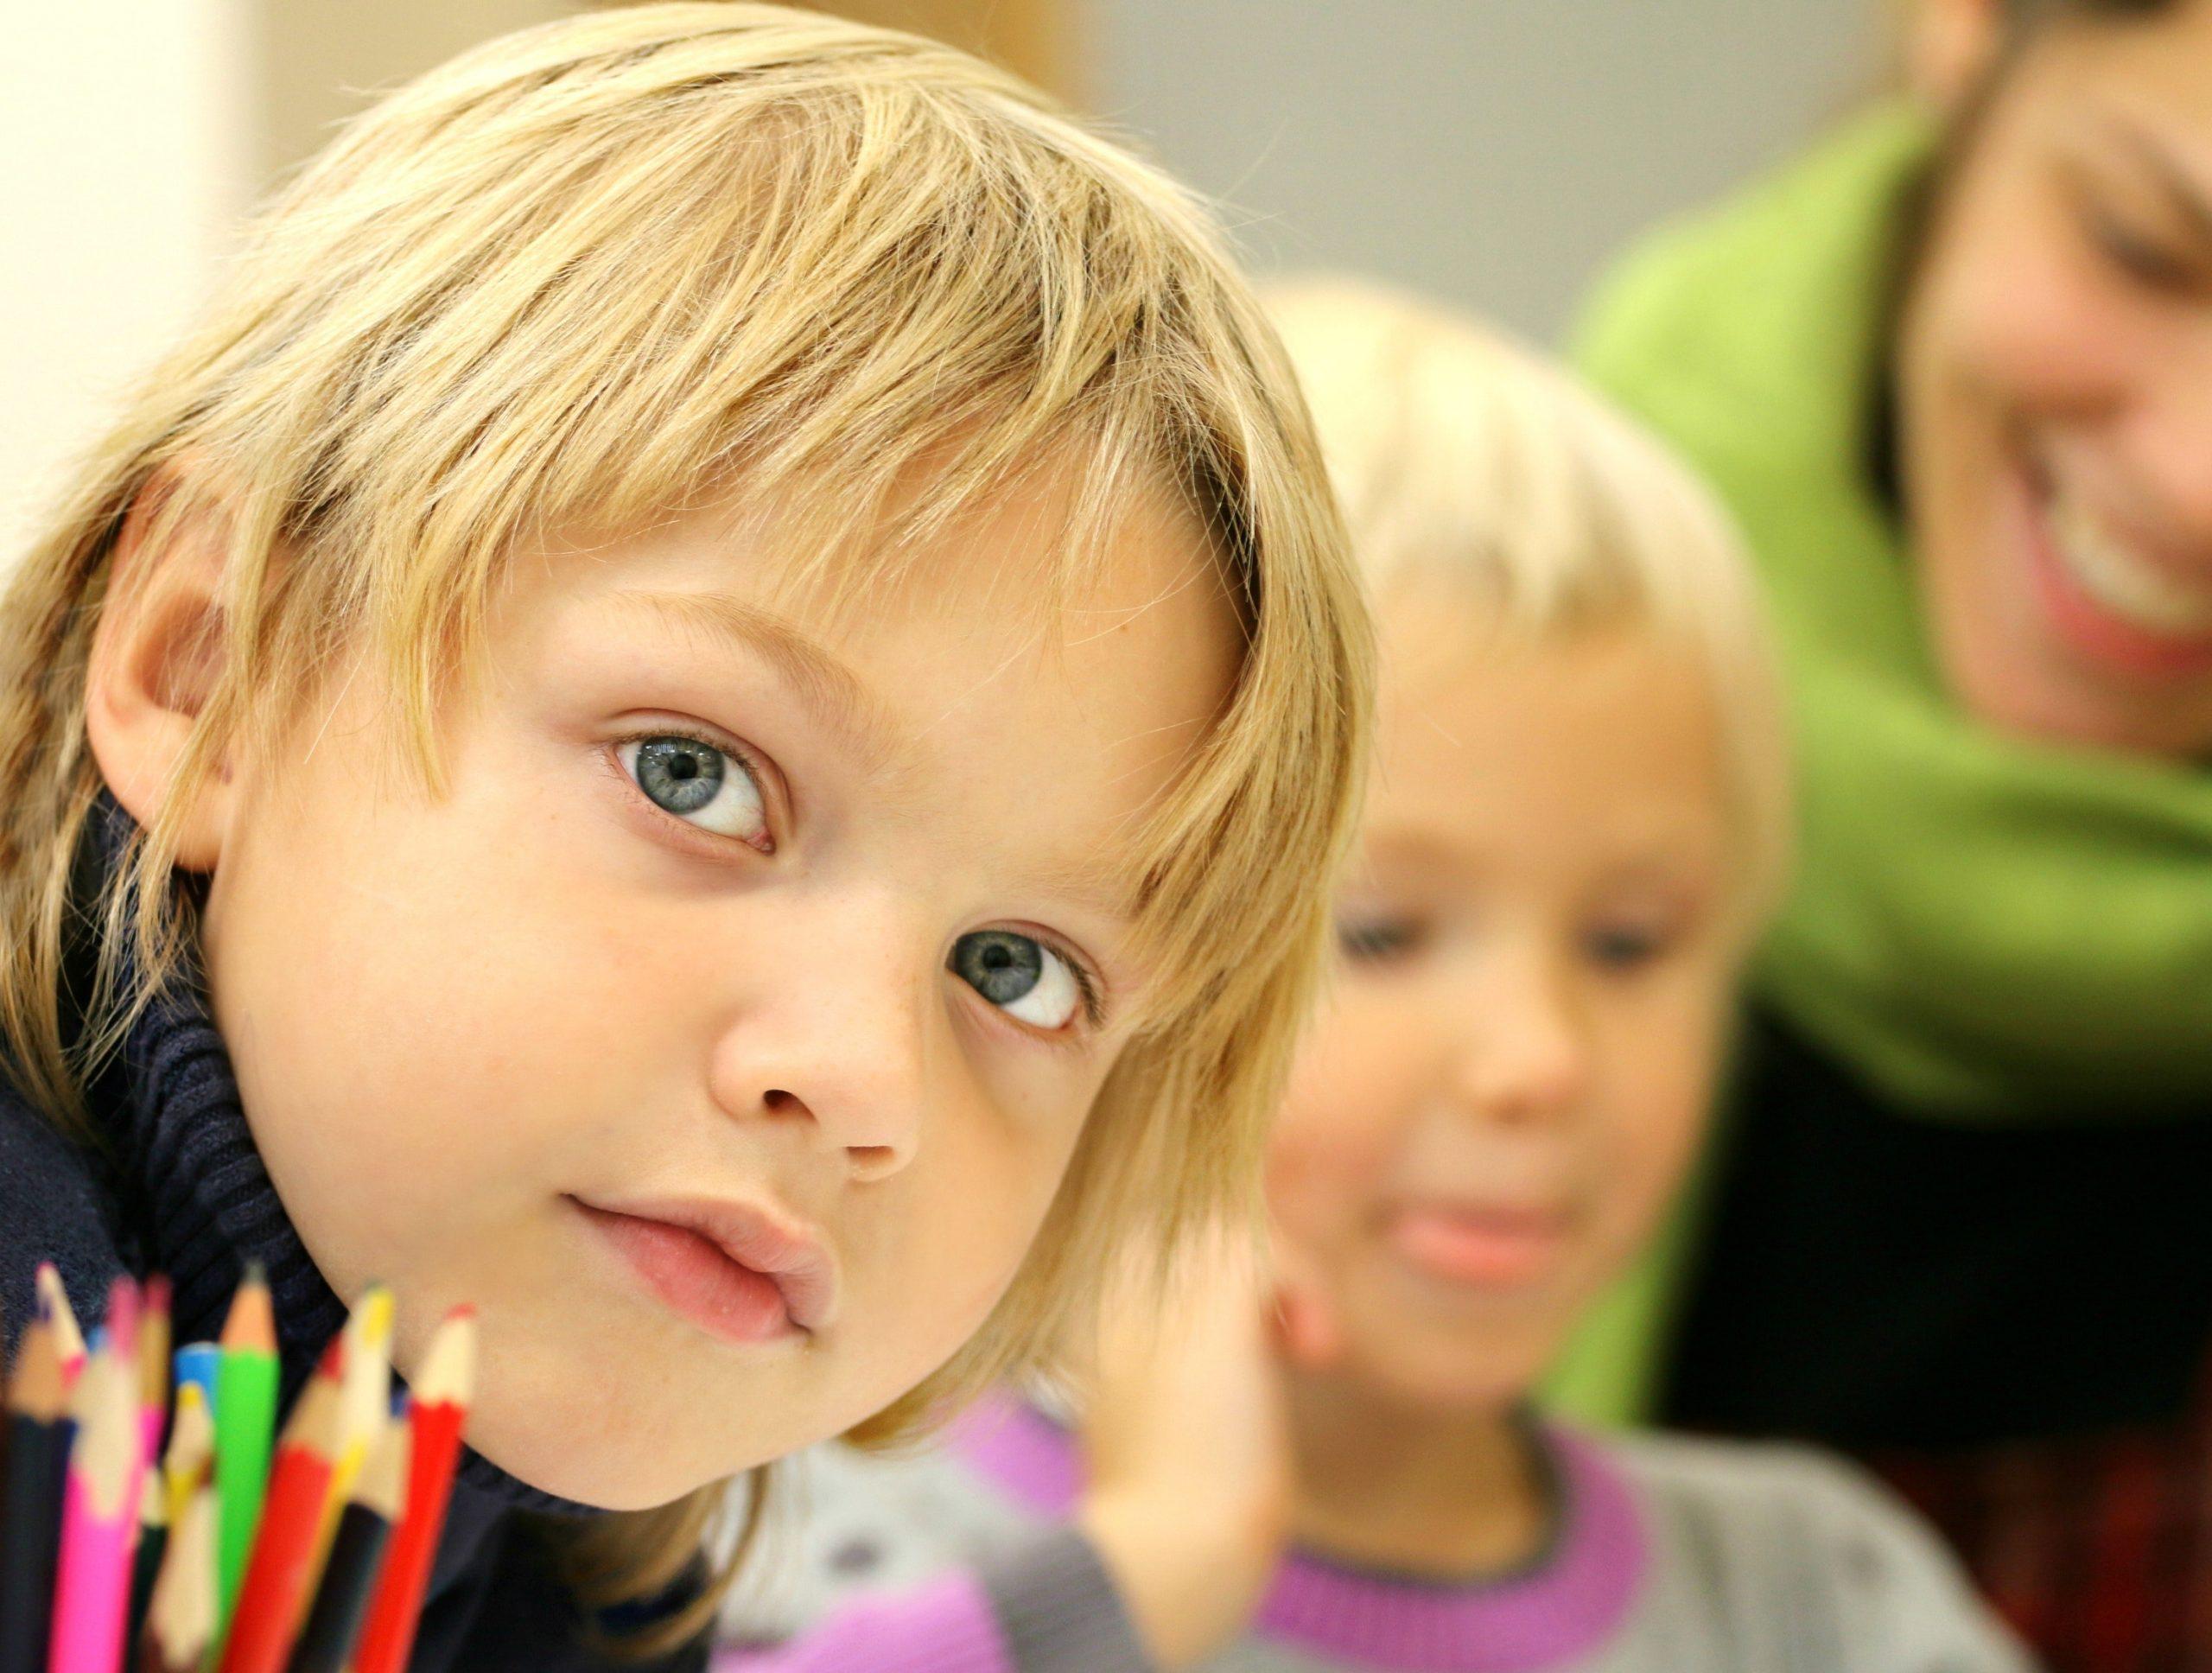 boy staring at camera with pencils